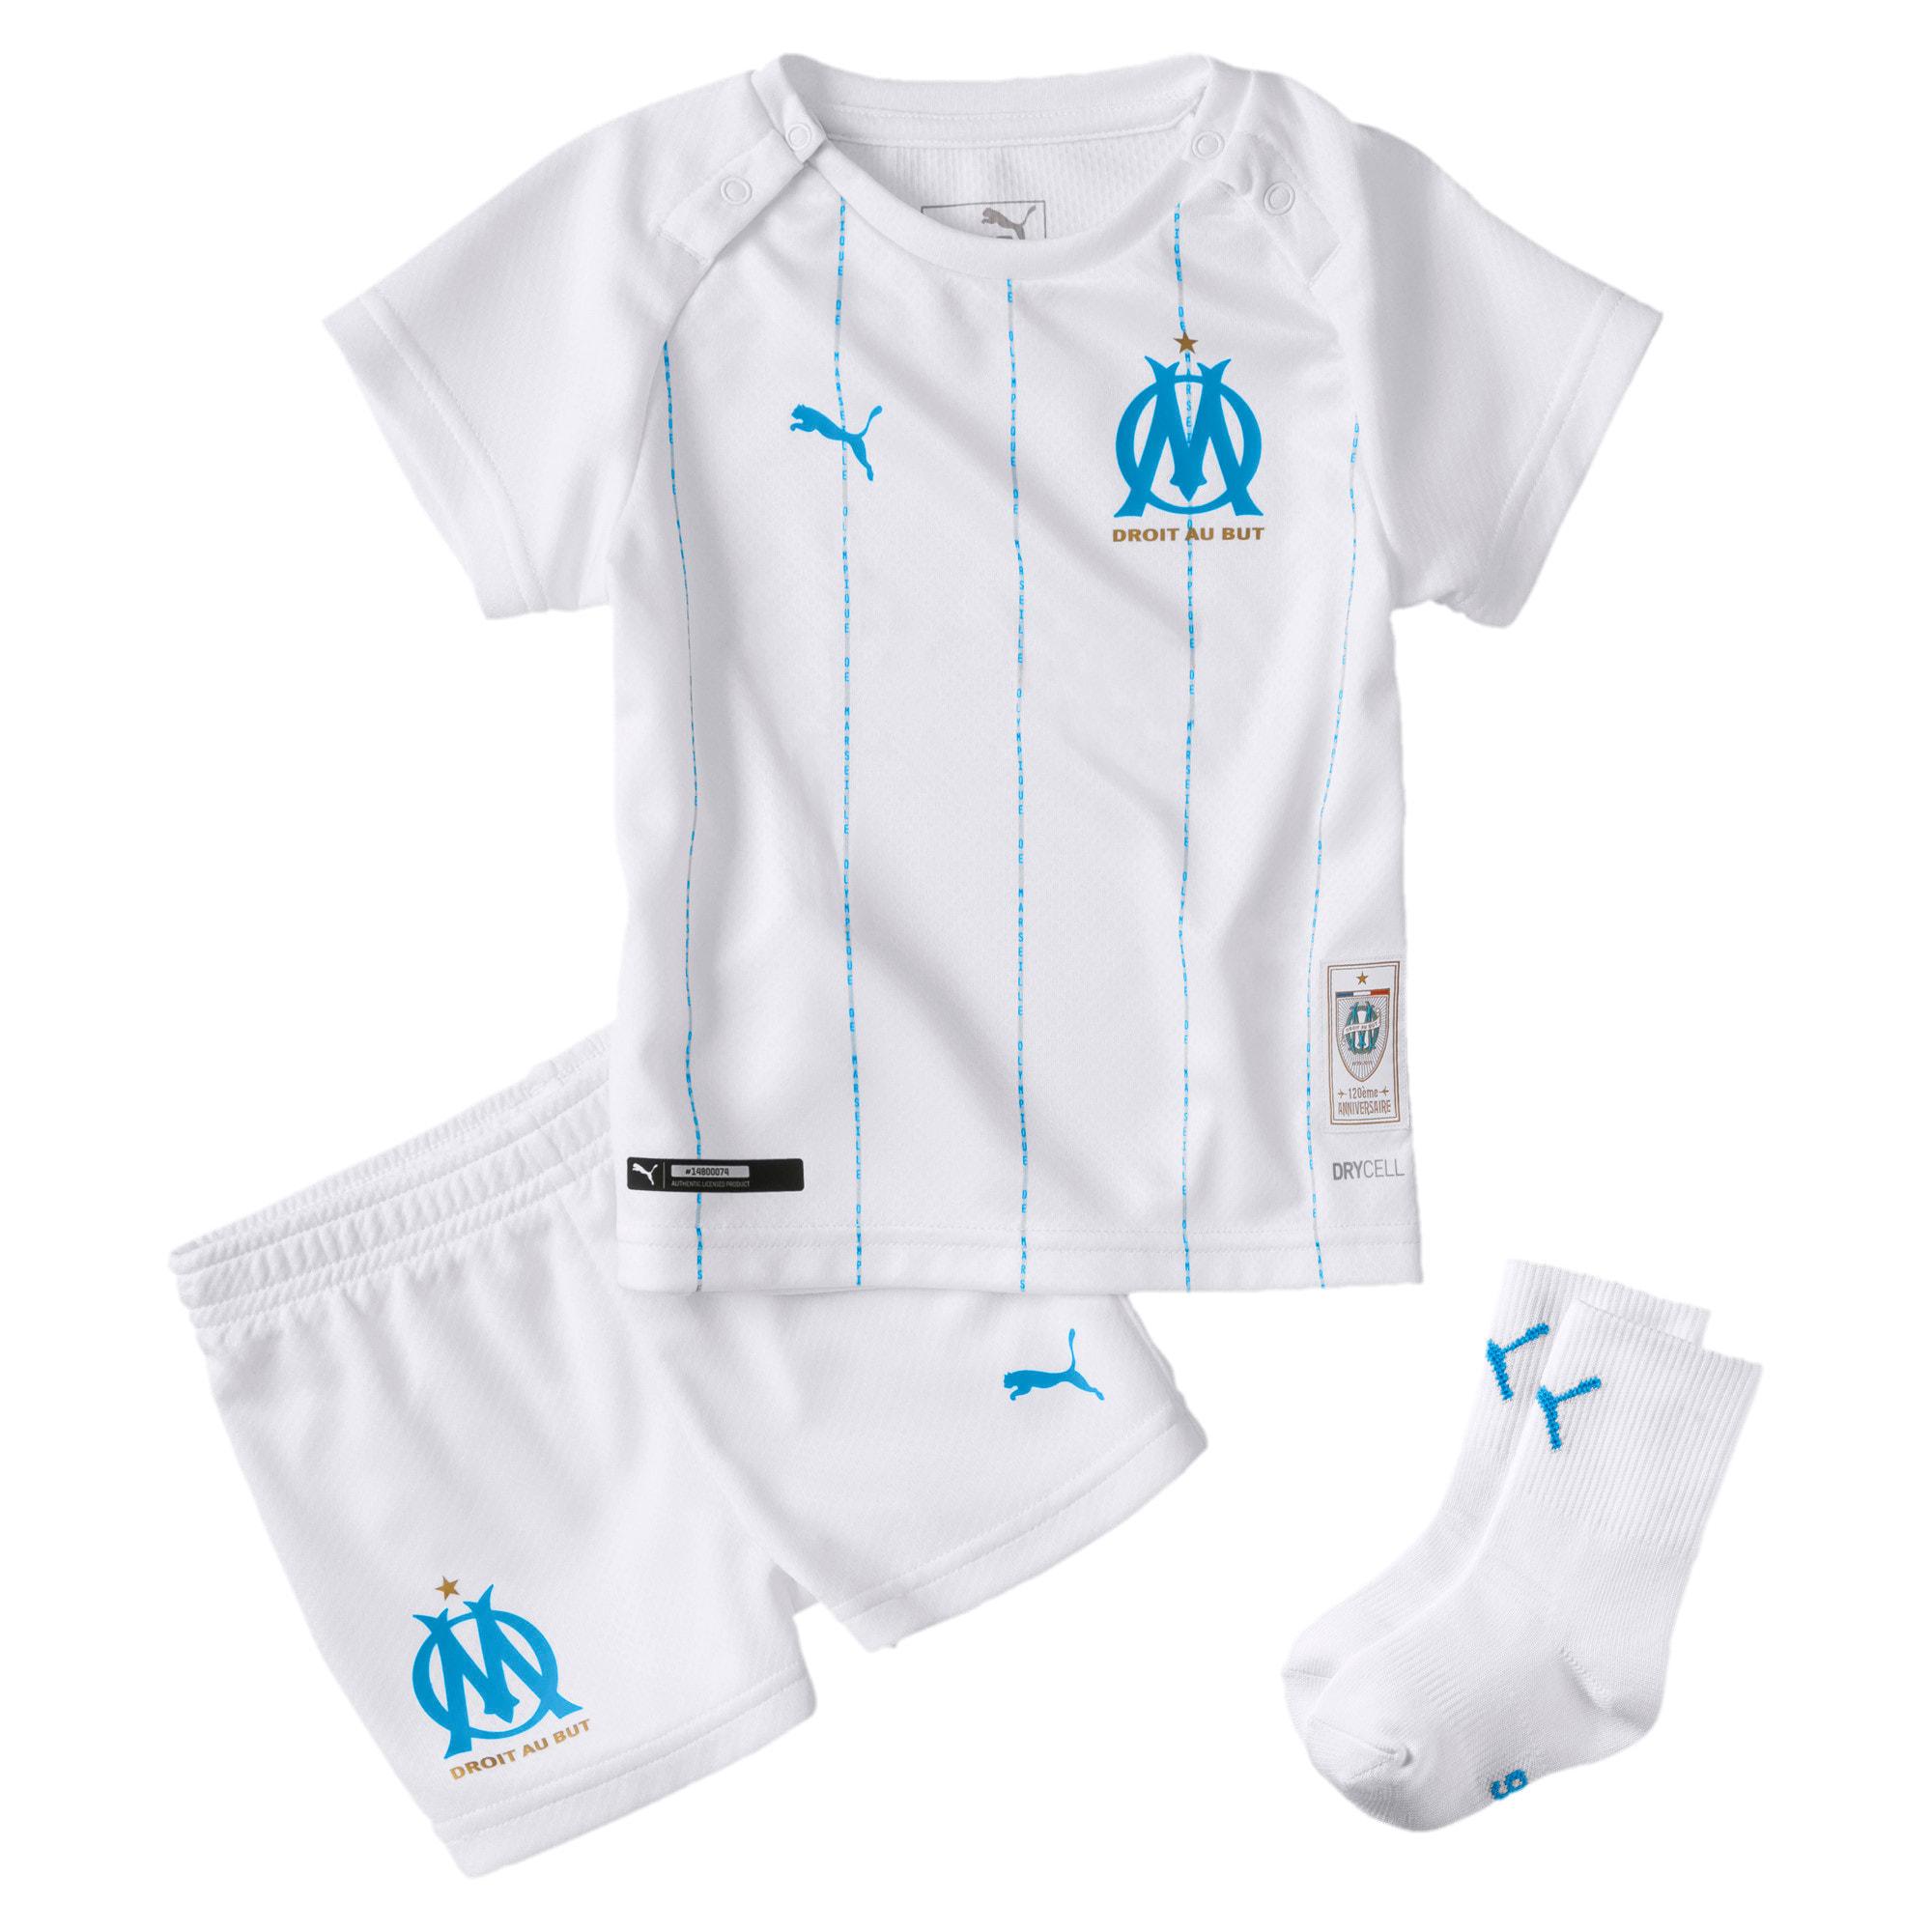 Olympique de Marseille Babies' Home Mini Kit, Wit/Blauw, Maat 86 | PUMA